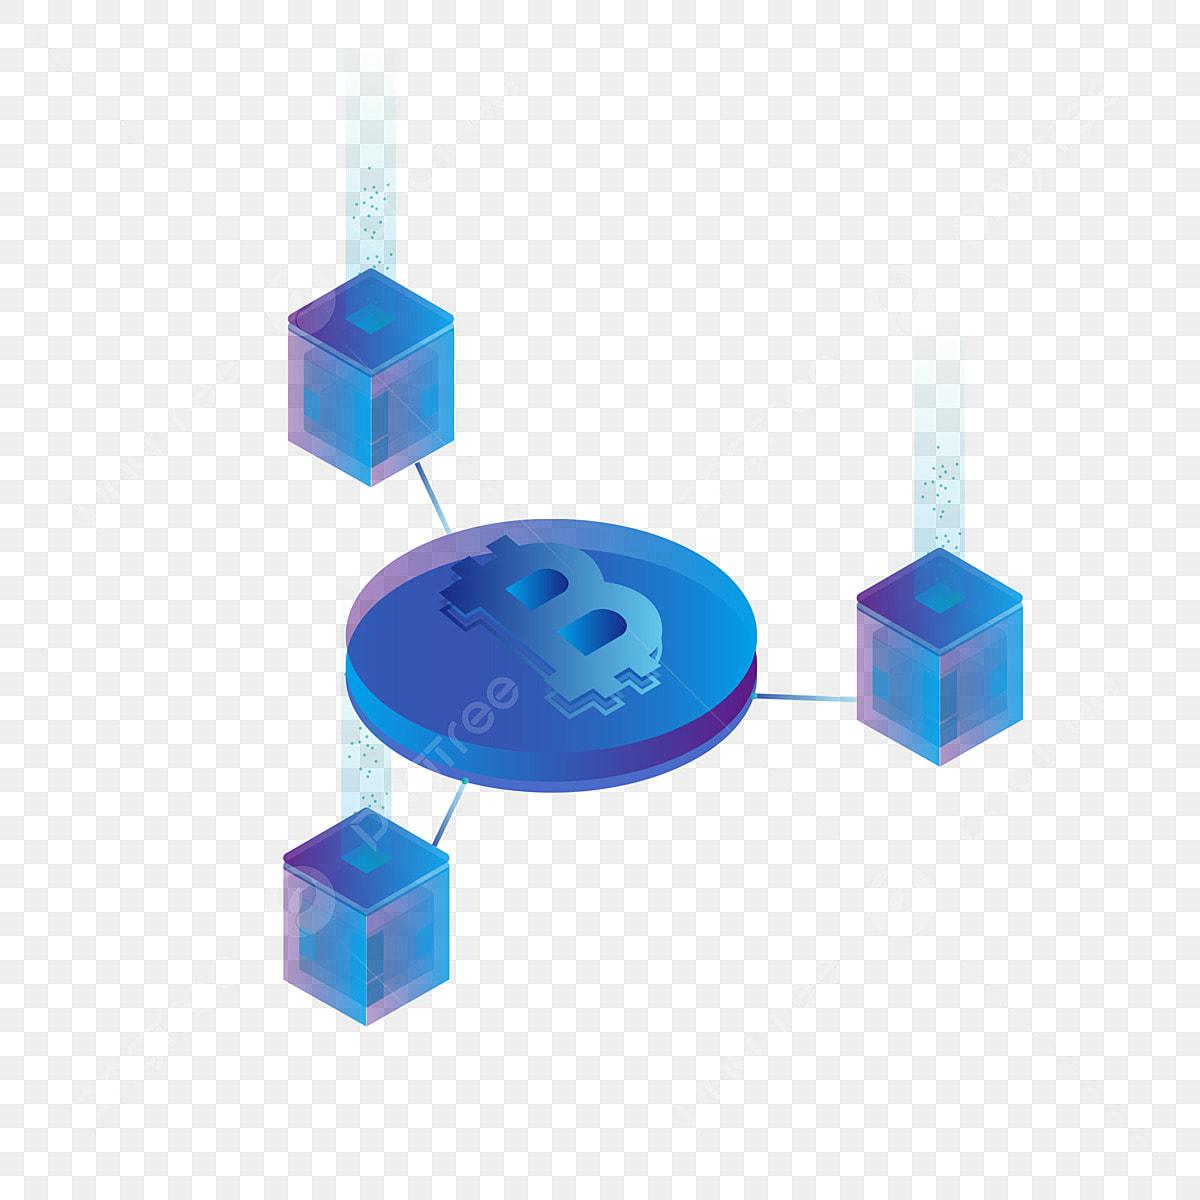 Science Fiction Bitcoin Generator, 2 5d, Bitcoin, Blockchain